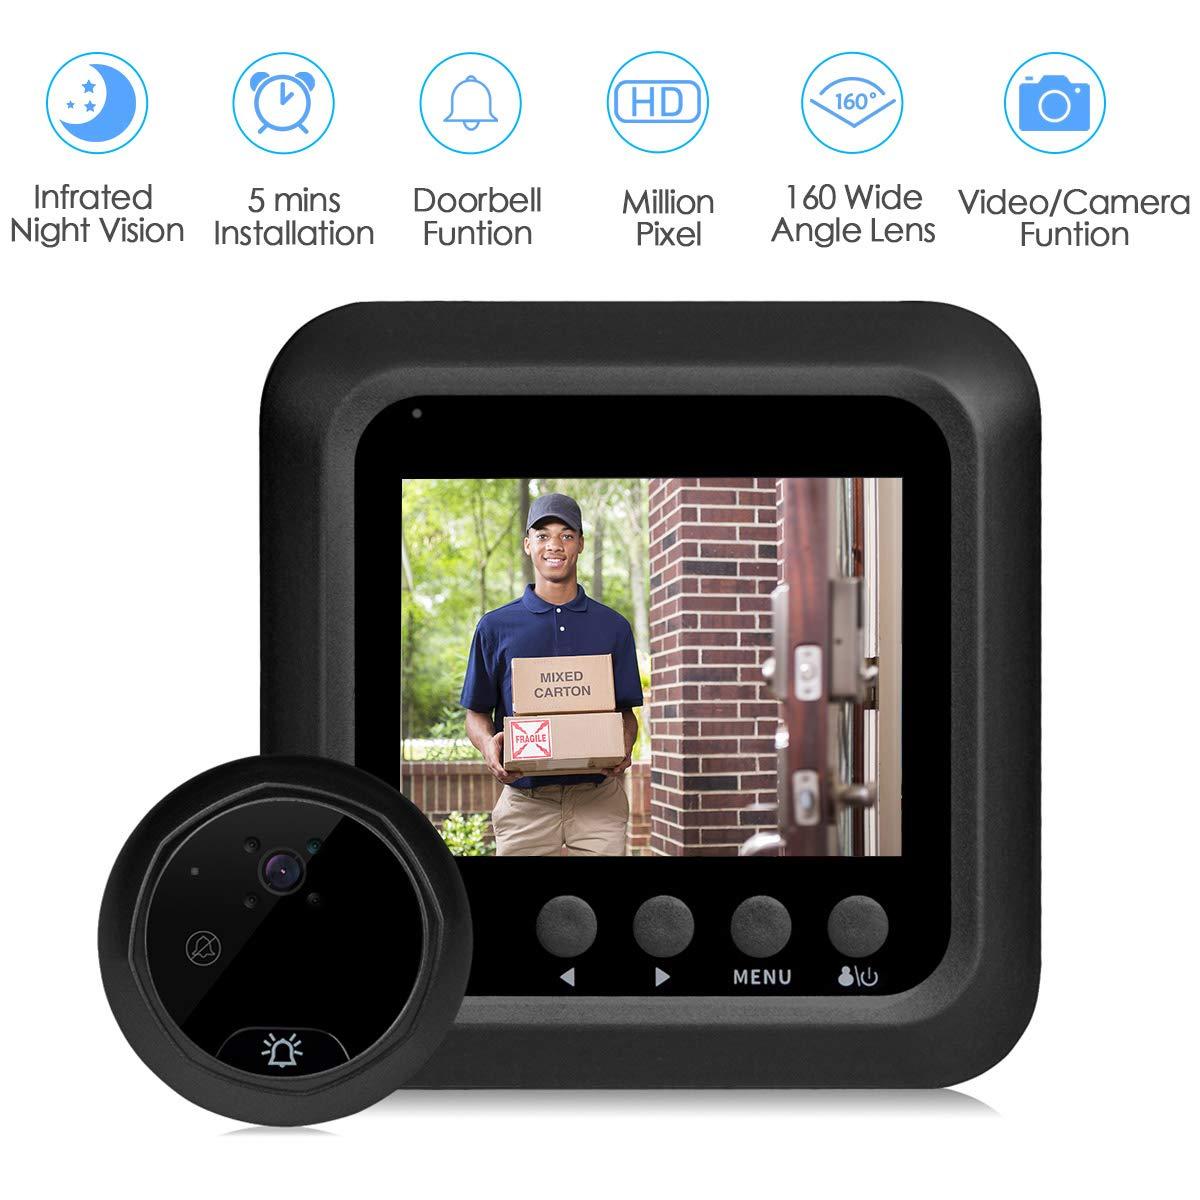 Home Wireless Video Doorbell HD, 2.4inch Peephole Door Bell Camera-160°Wide Angle Lens-Night Vision-NO WiFi/NO APP-Peephole Needed (Doorbell)